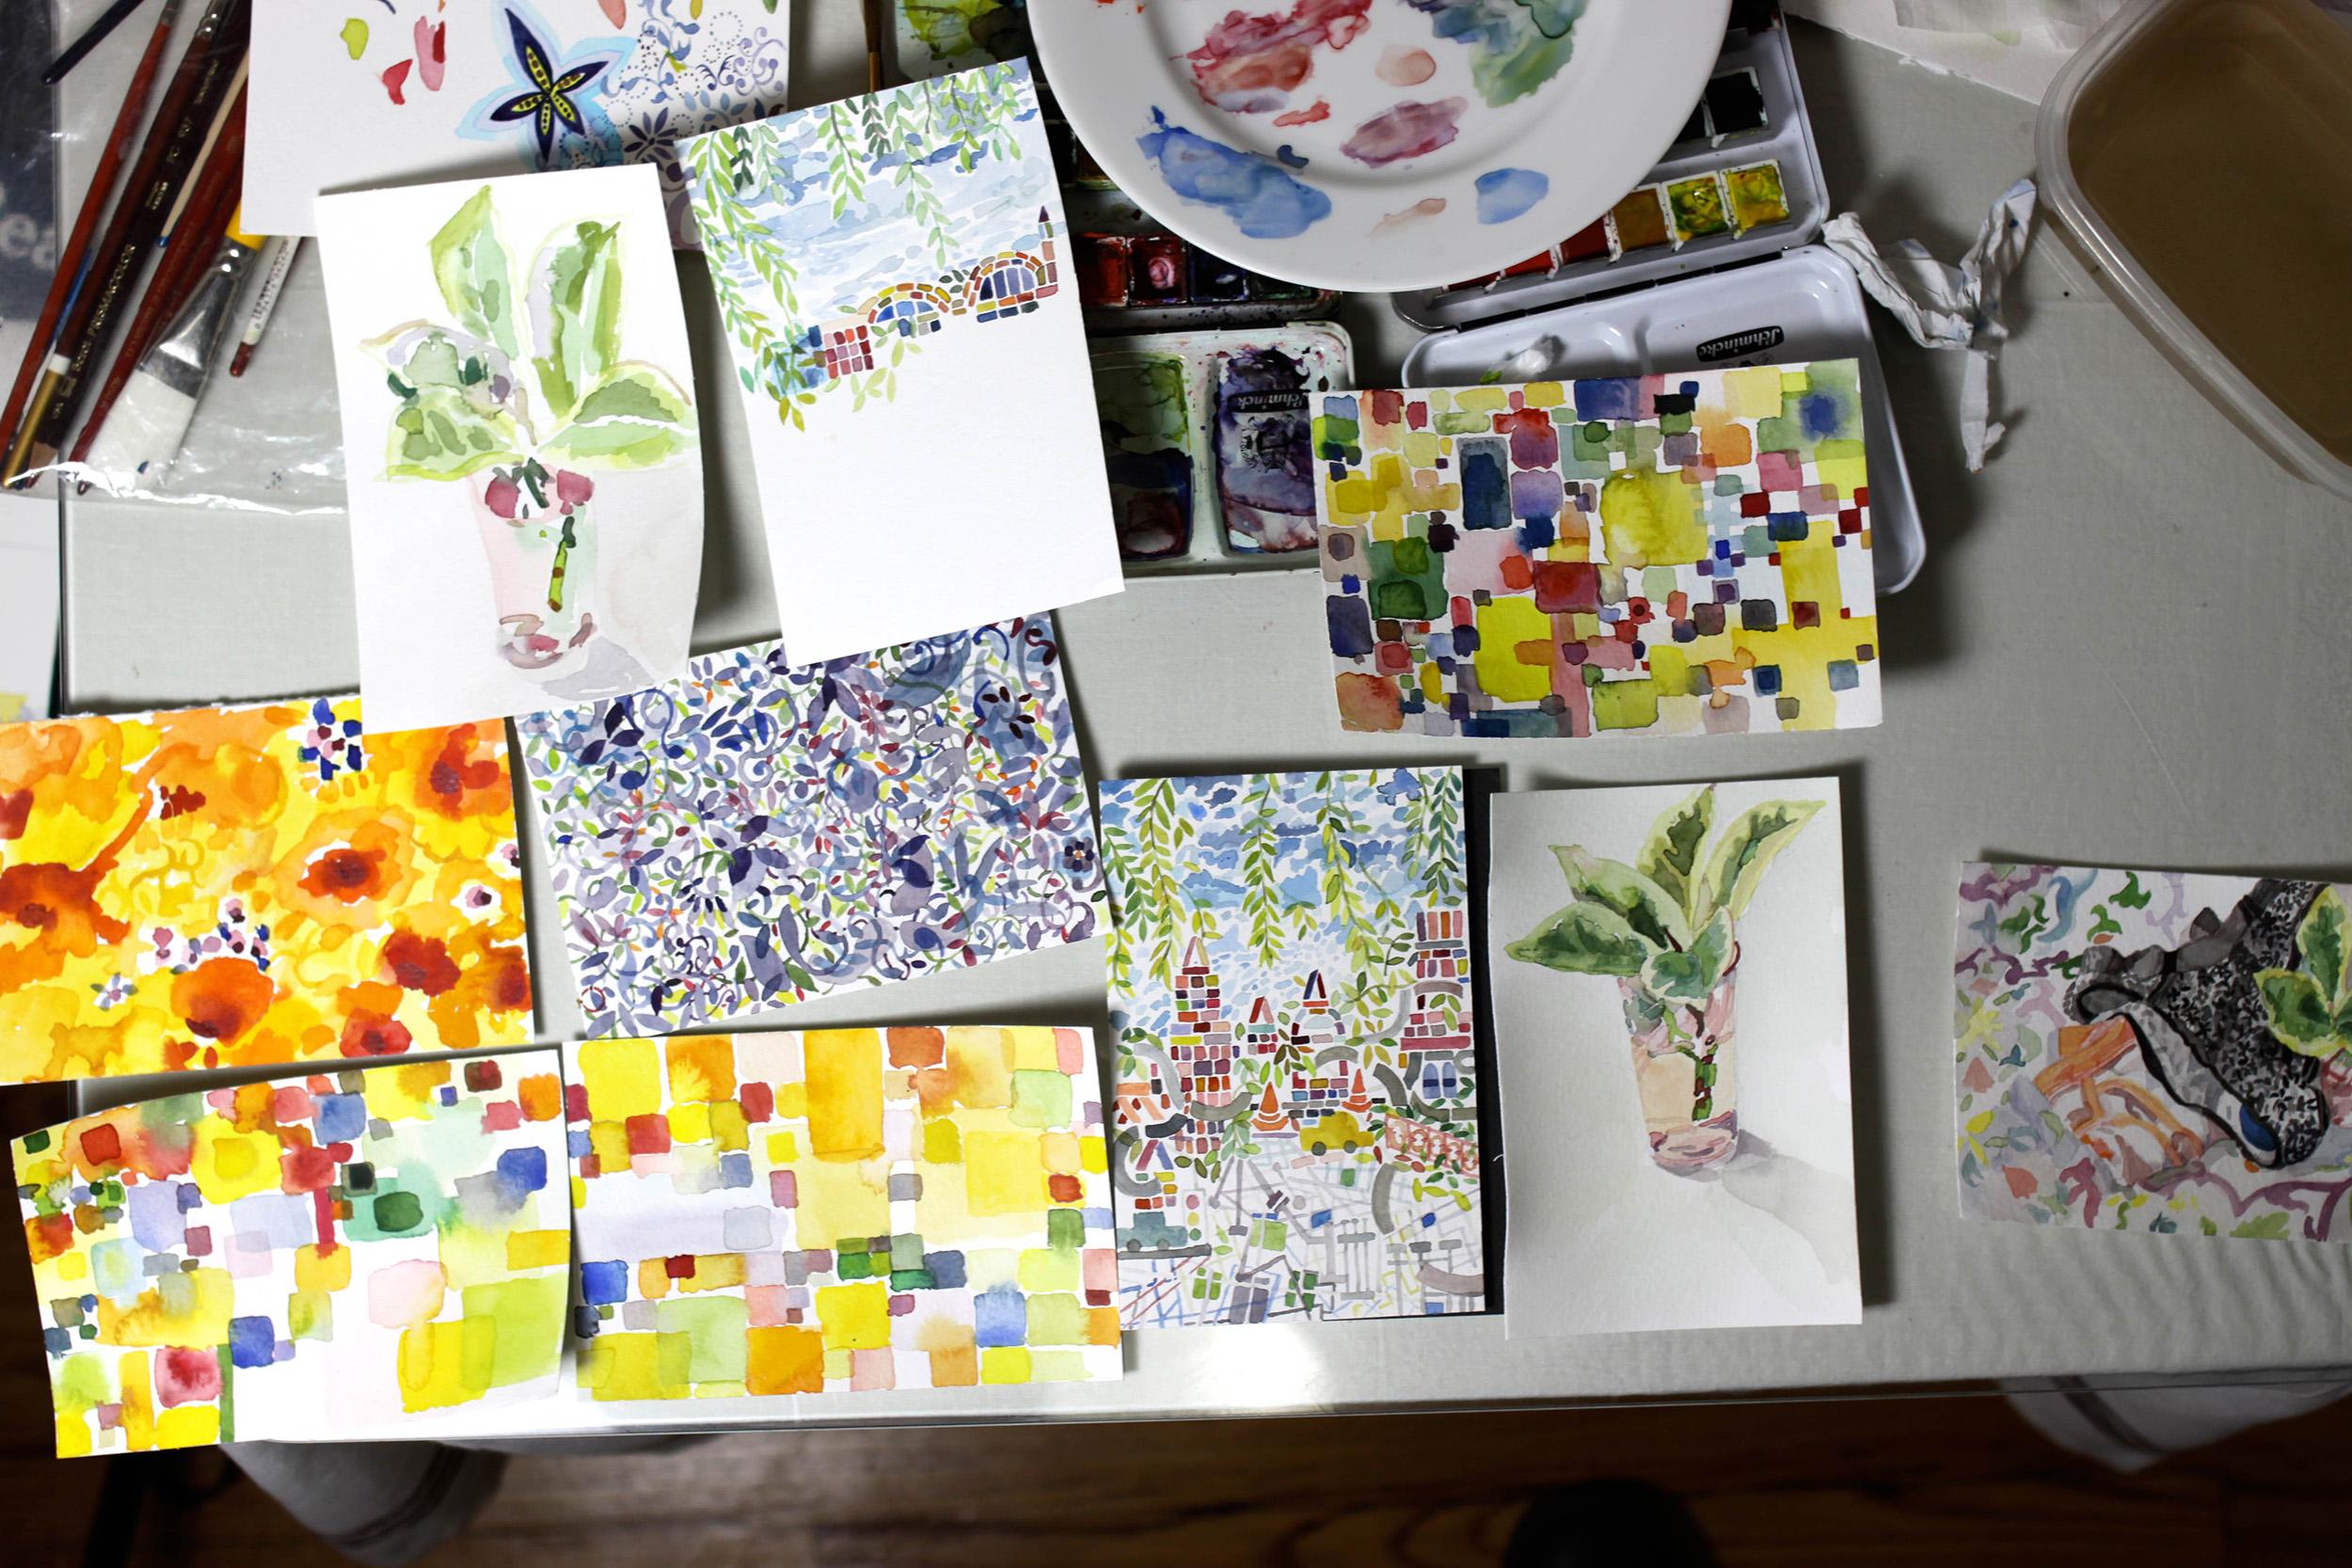 2008. Postcards in studio photo